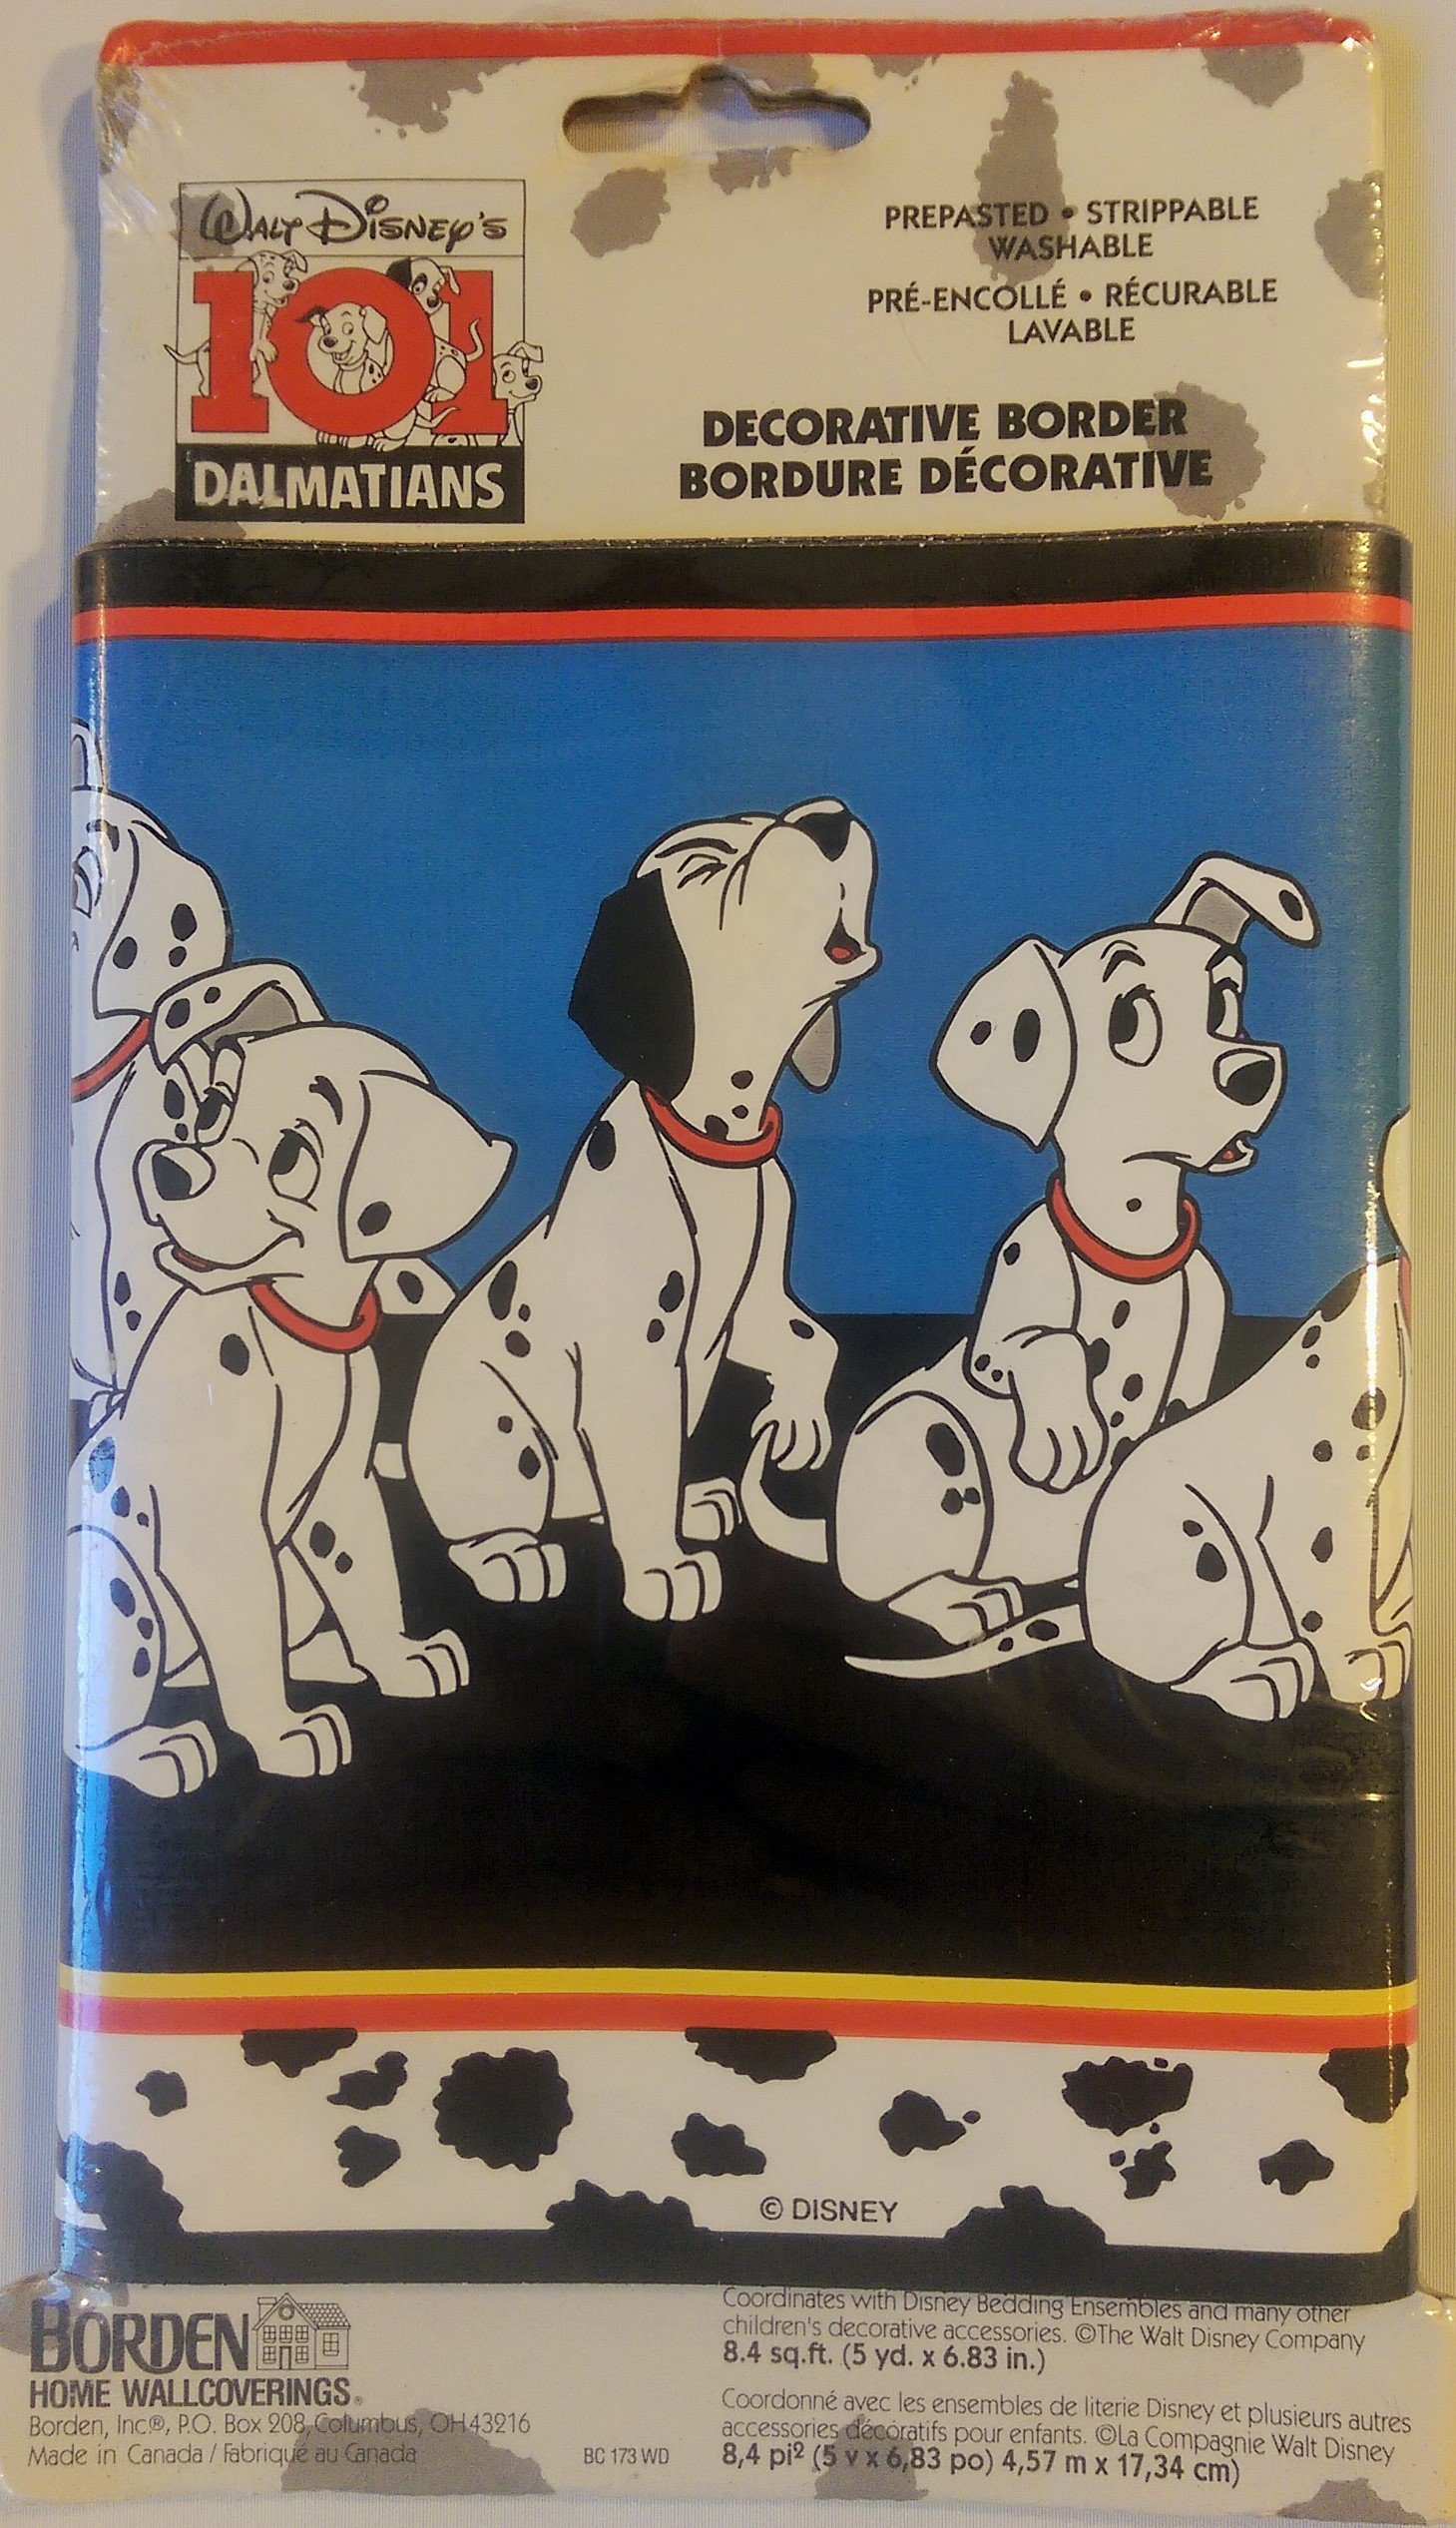 Walt Disney's 101 Dalmatians Wallpaper Border 8.4 SQ Ft (5 yd by 6.83 in)